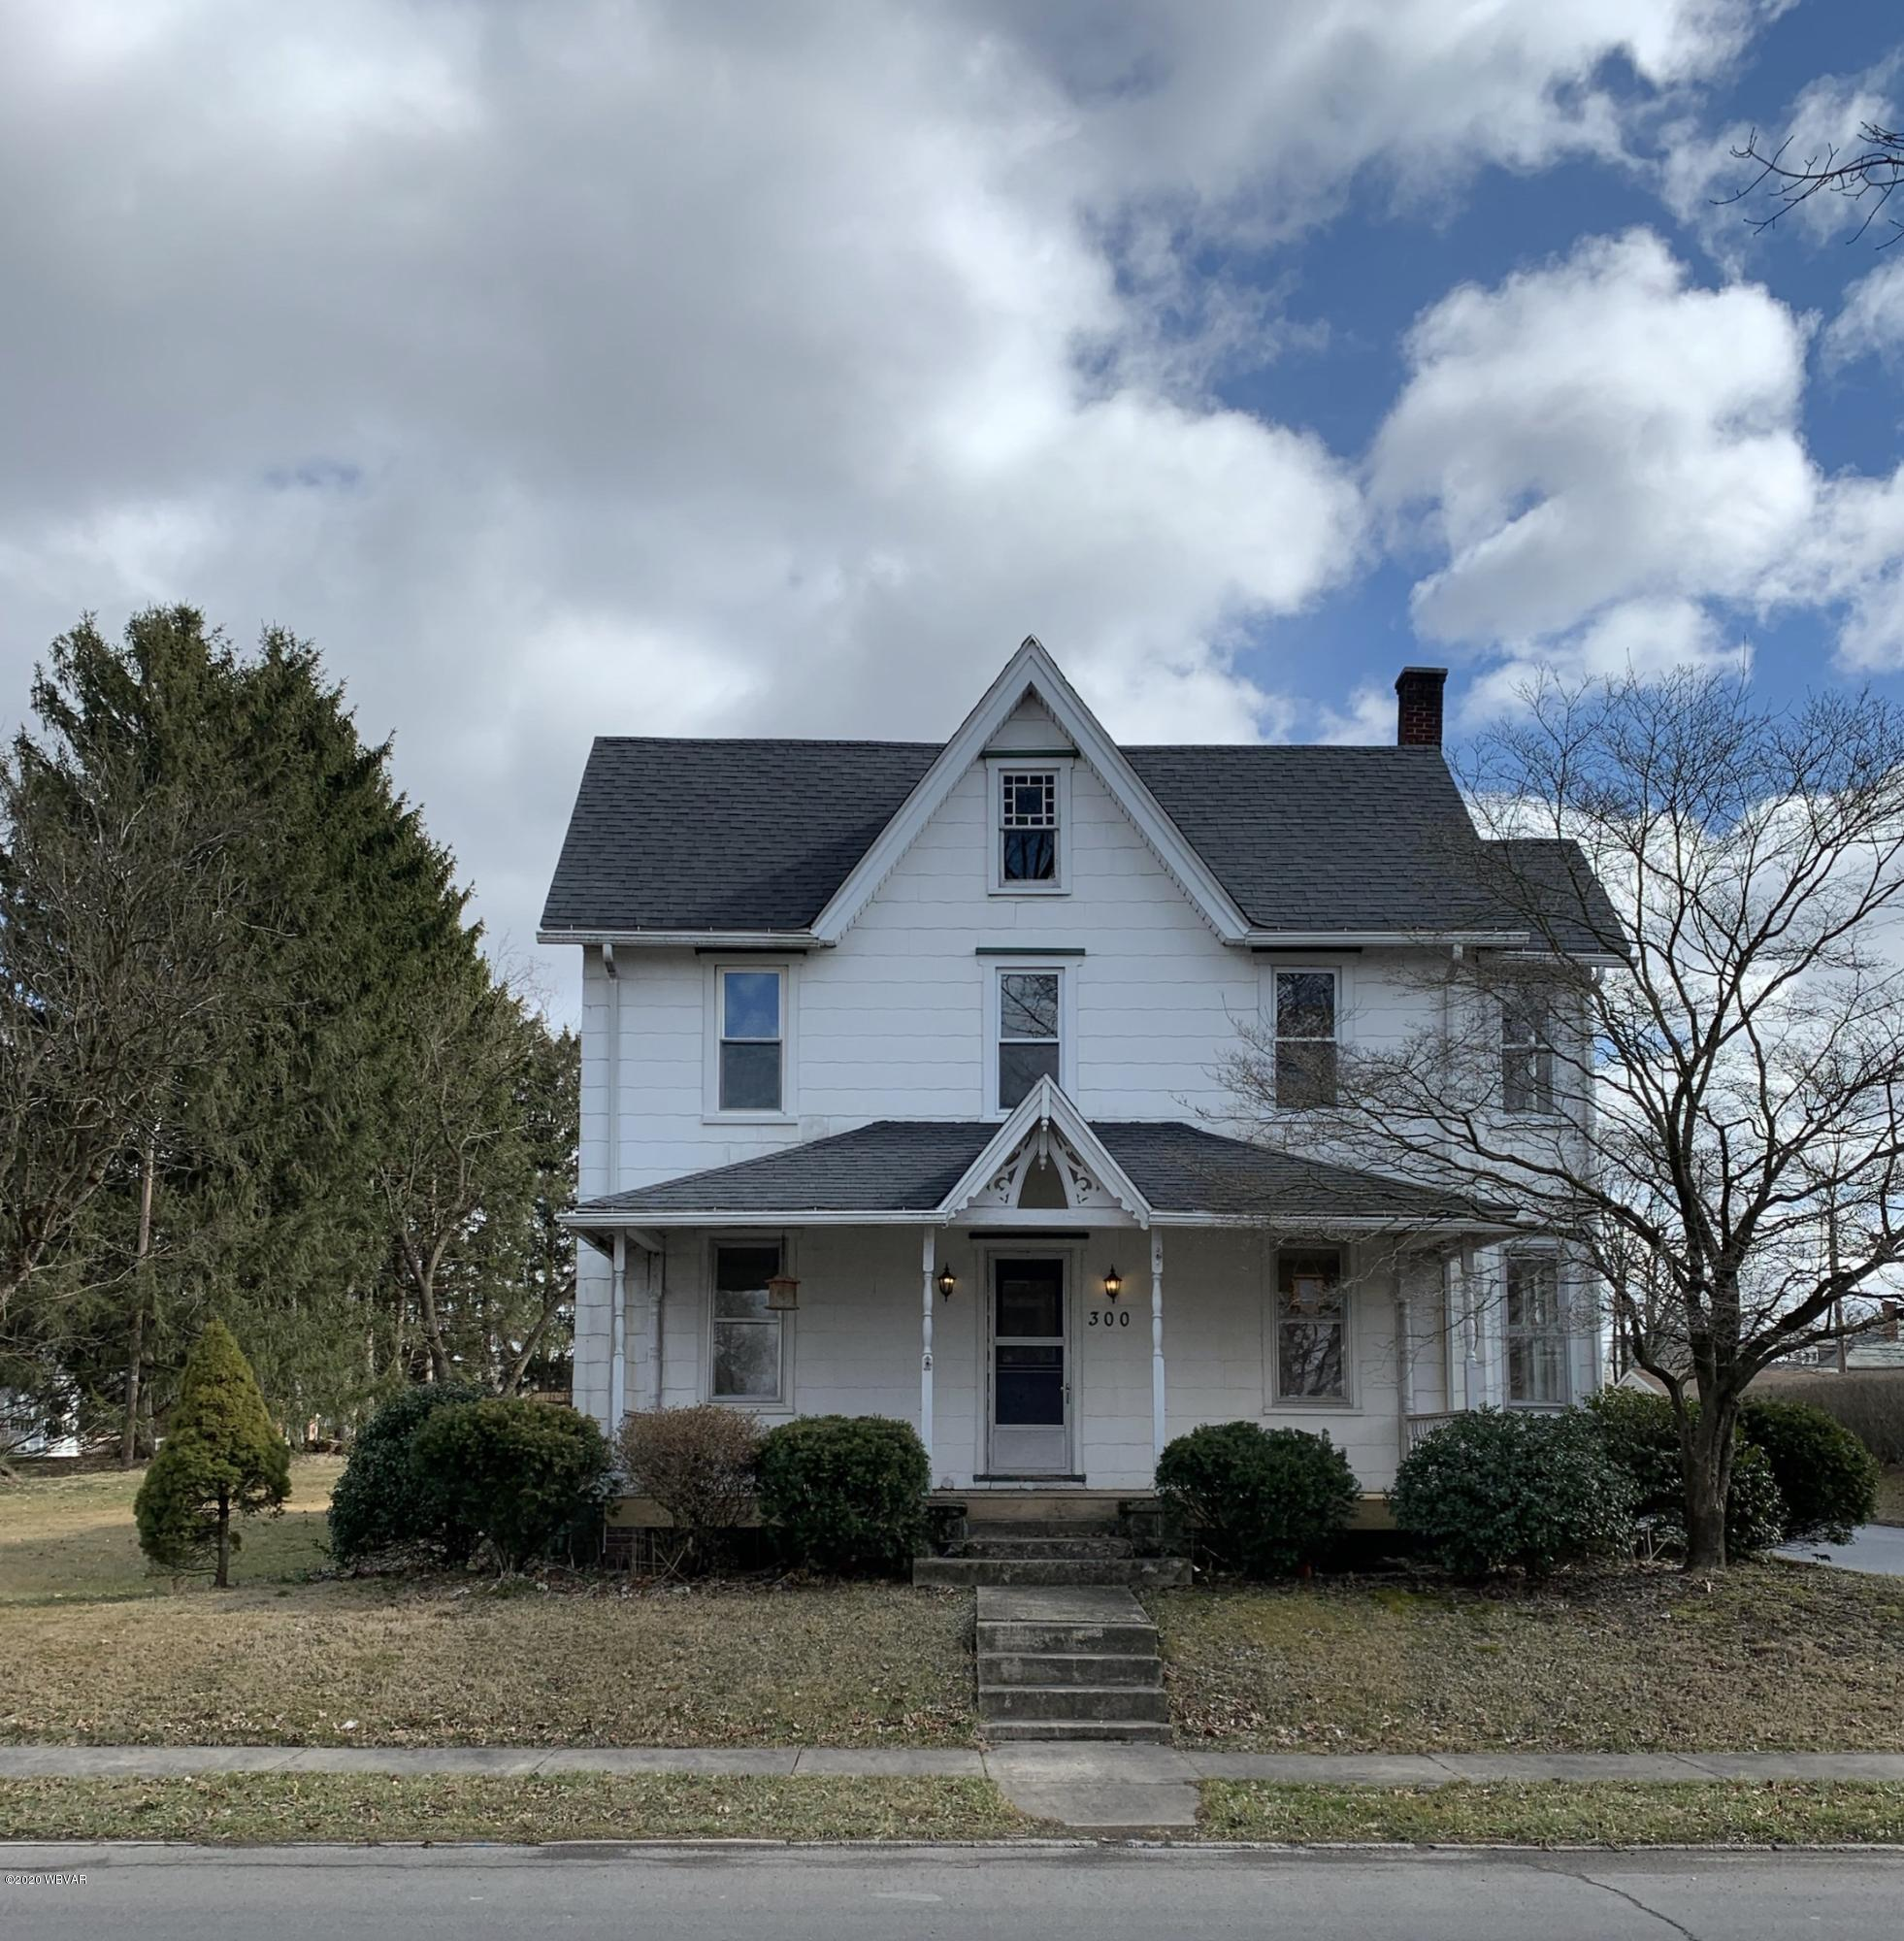 300 MONTOUR STREET,Montoursville,PA 17754,4 Bedrooms Bedrooms,1.5 BathroomsBathrooms,Residential,MONTOUR,WB-89690